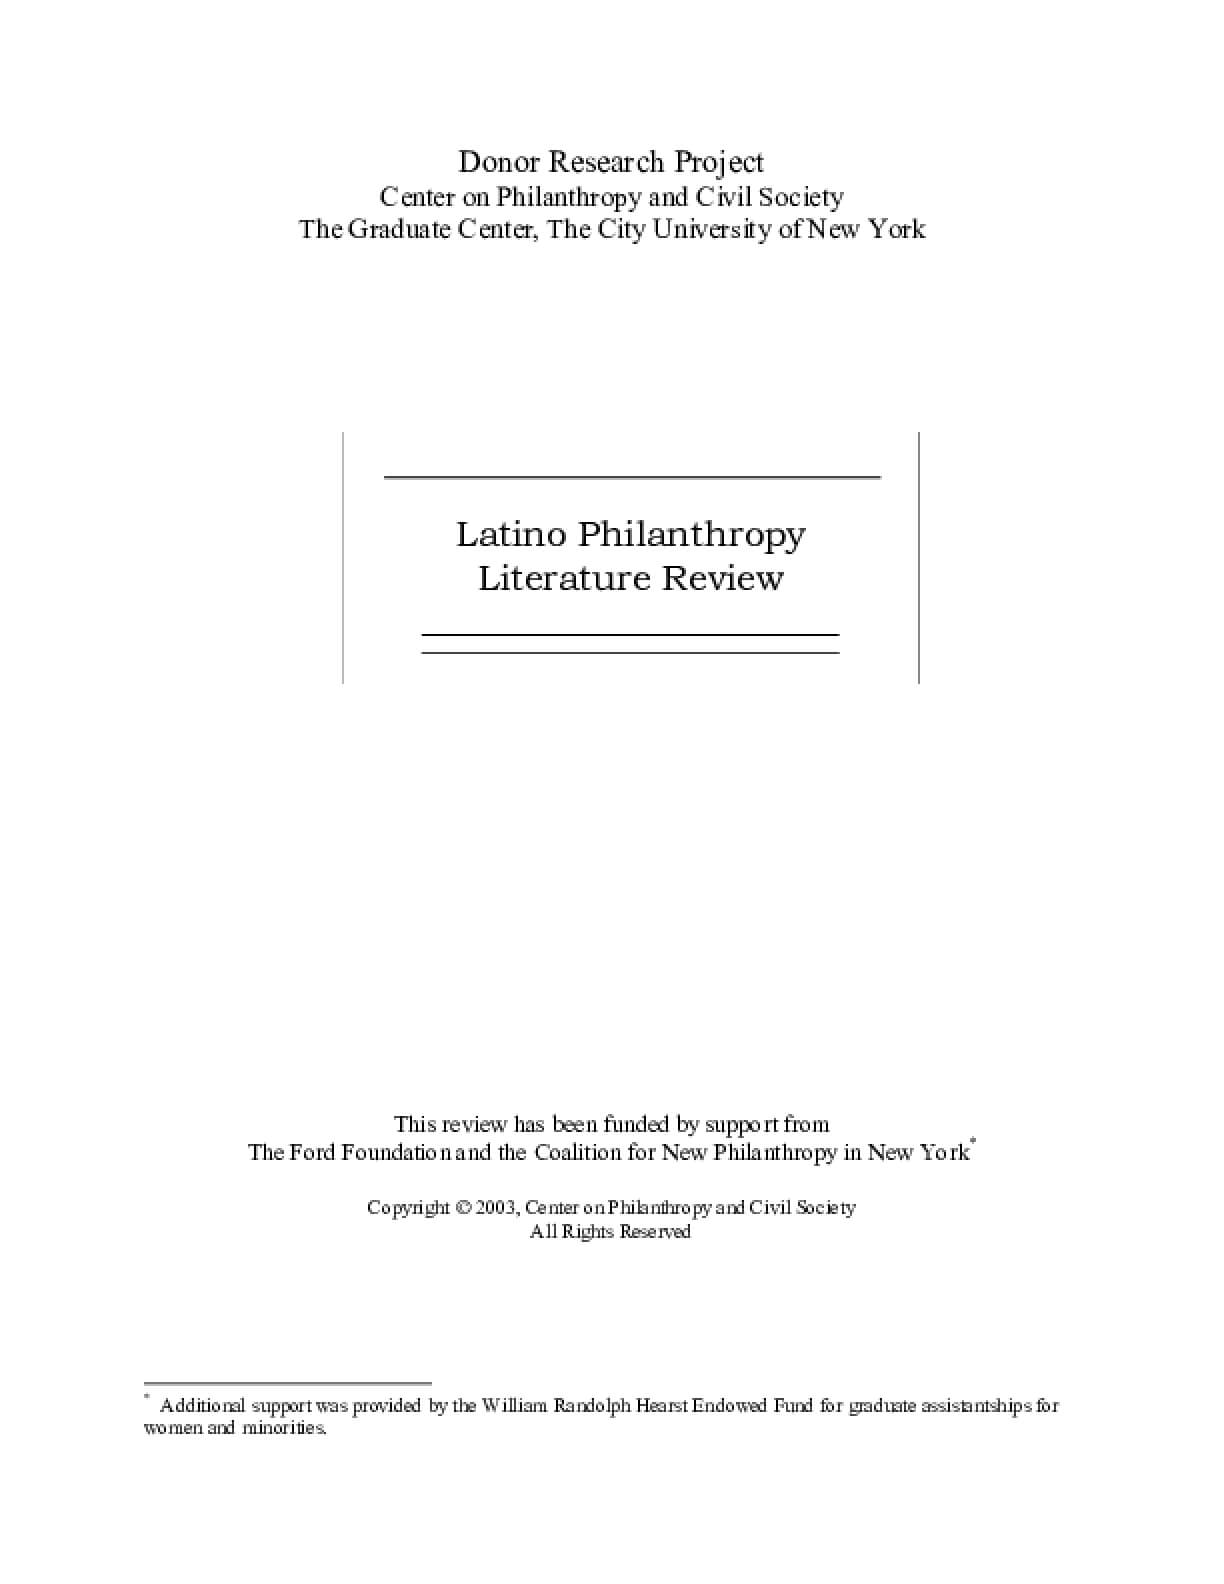 Latino Philanthropy: Literature Review